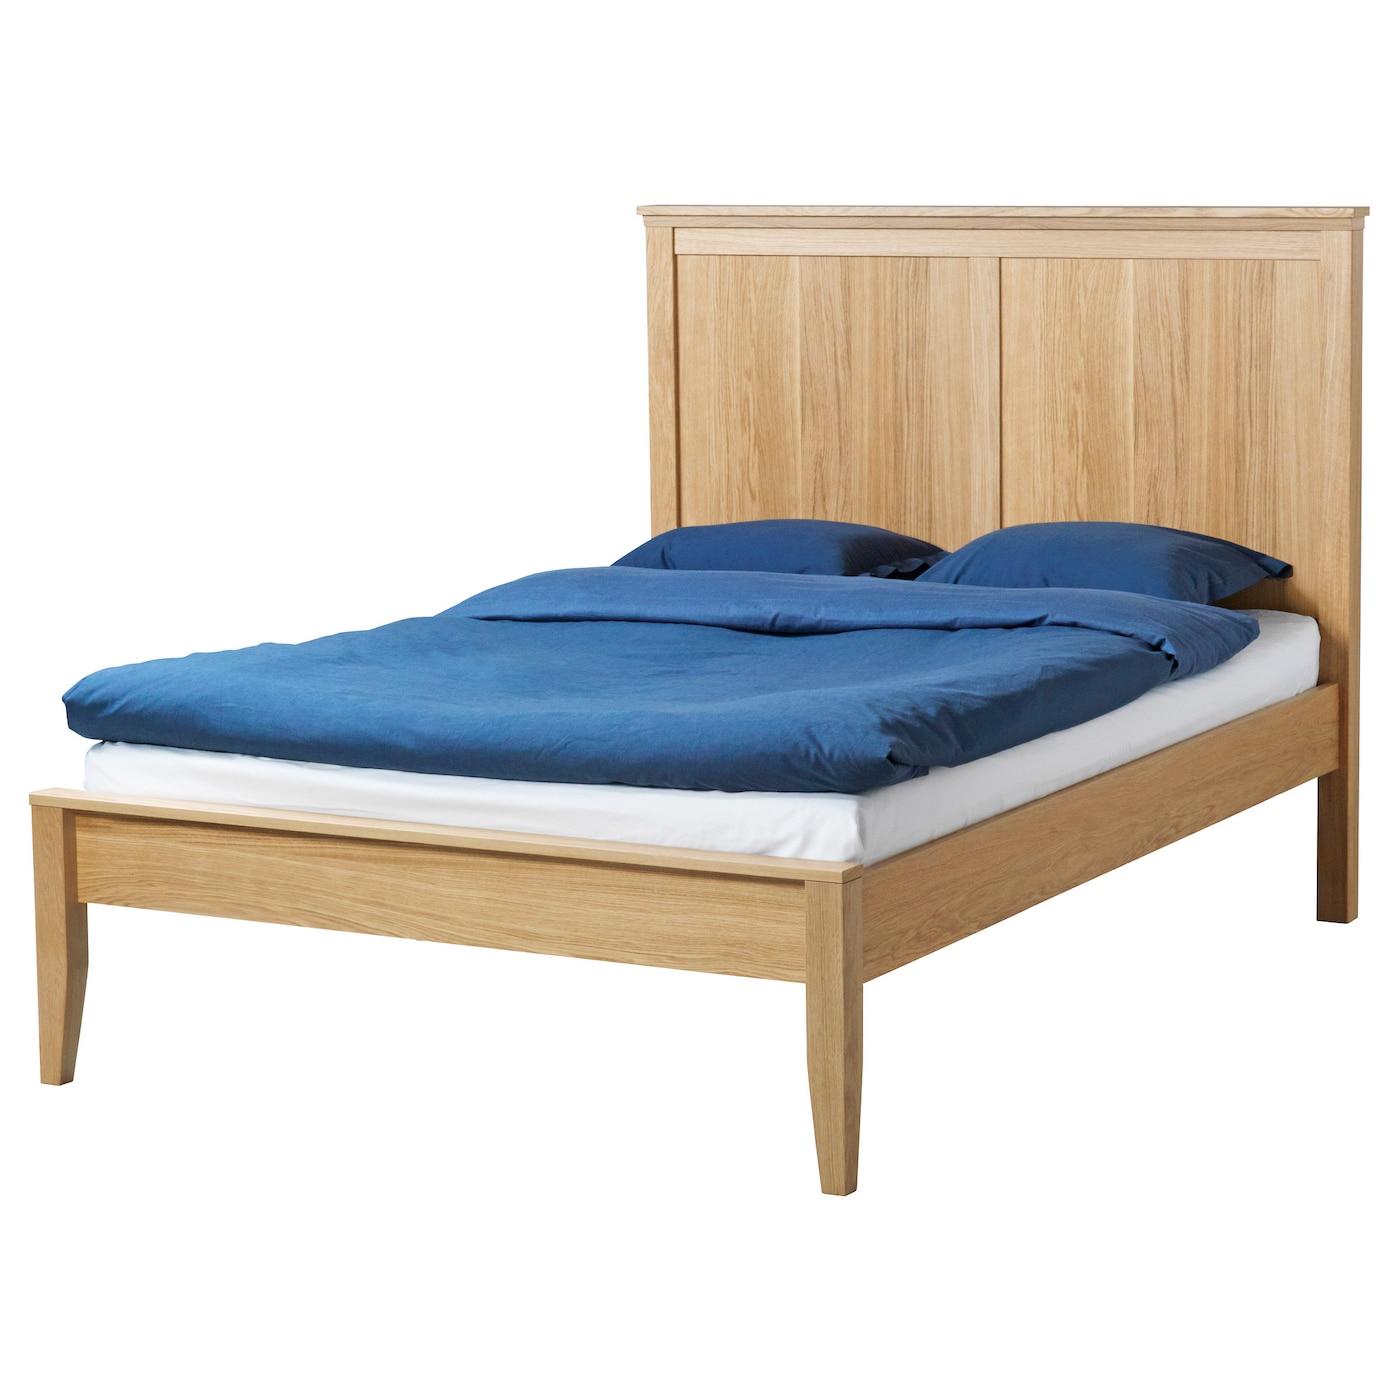 herefoss bed frame oaklury standard king ikea - Ikea King Size Bed Frame